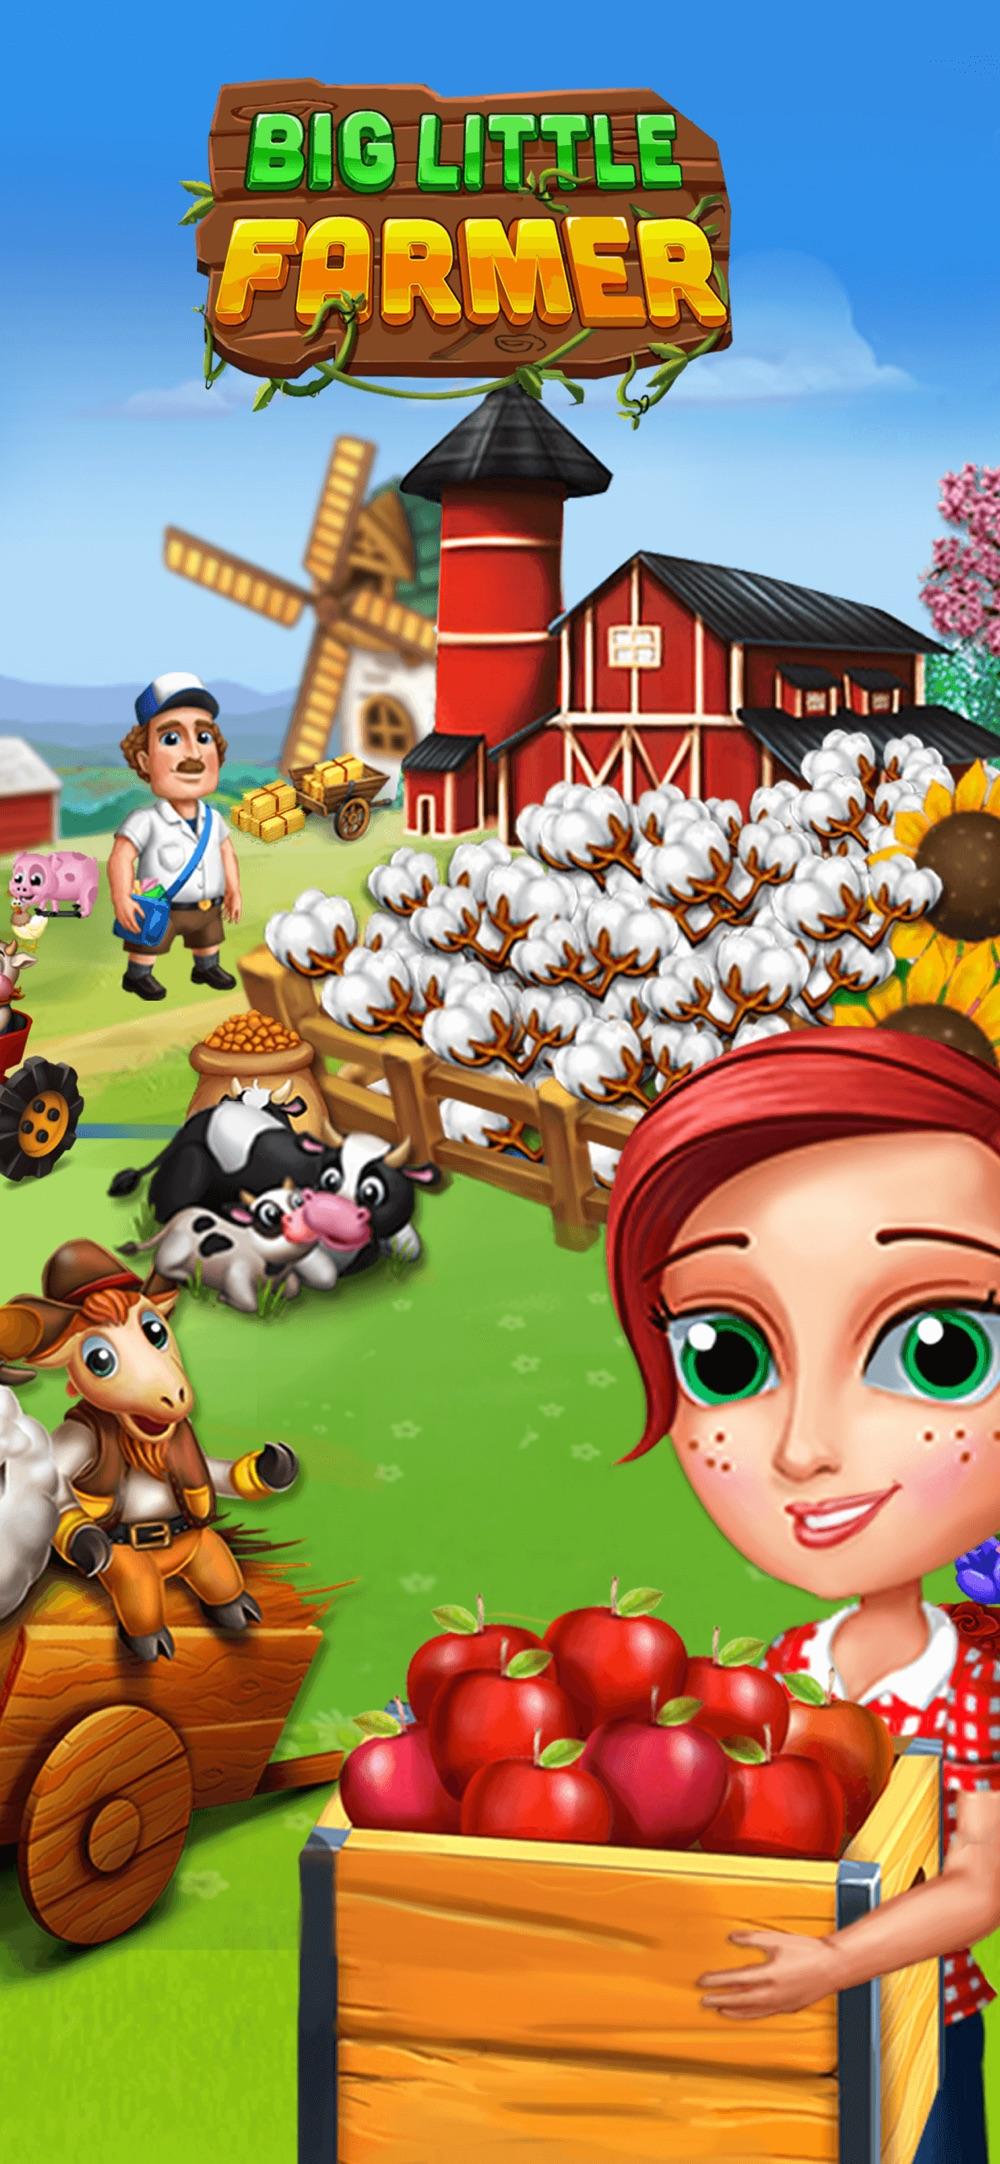 Big Little Farmer Offline Game hack tool